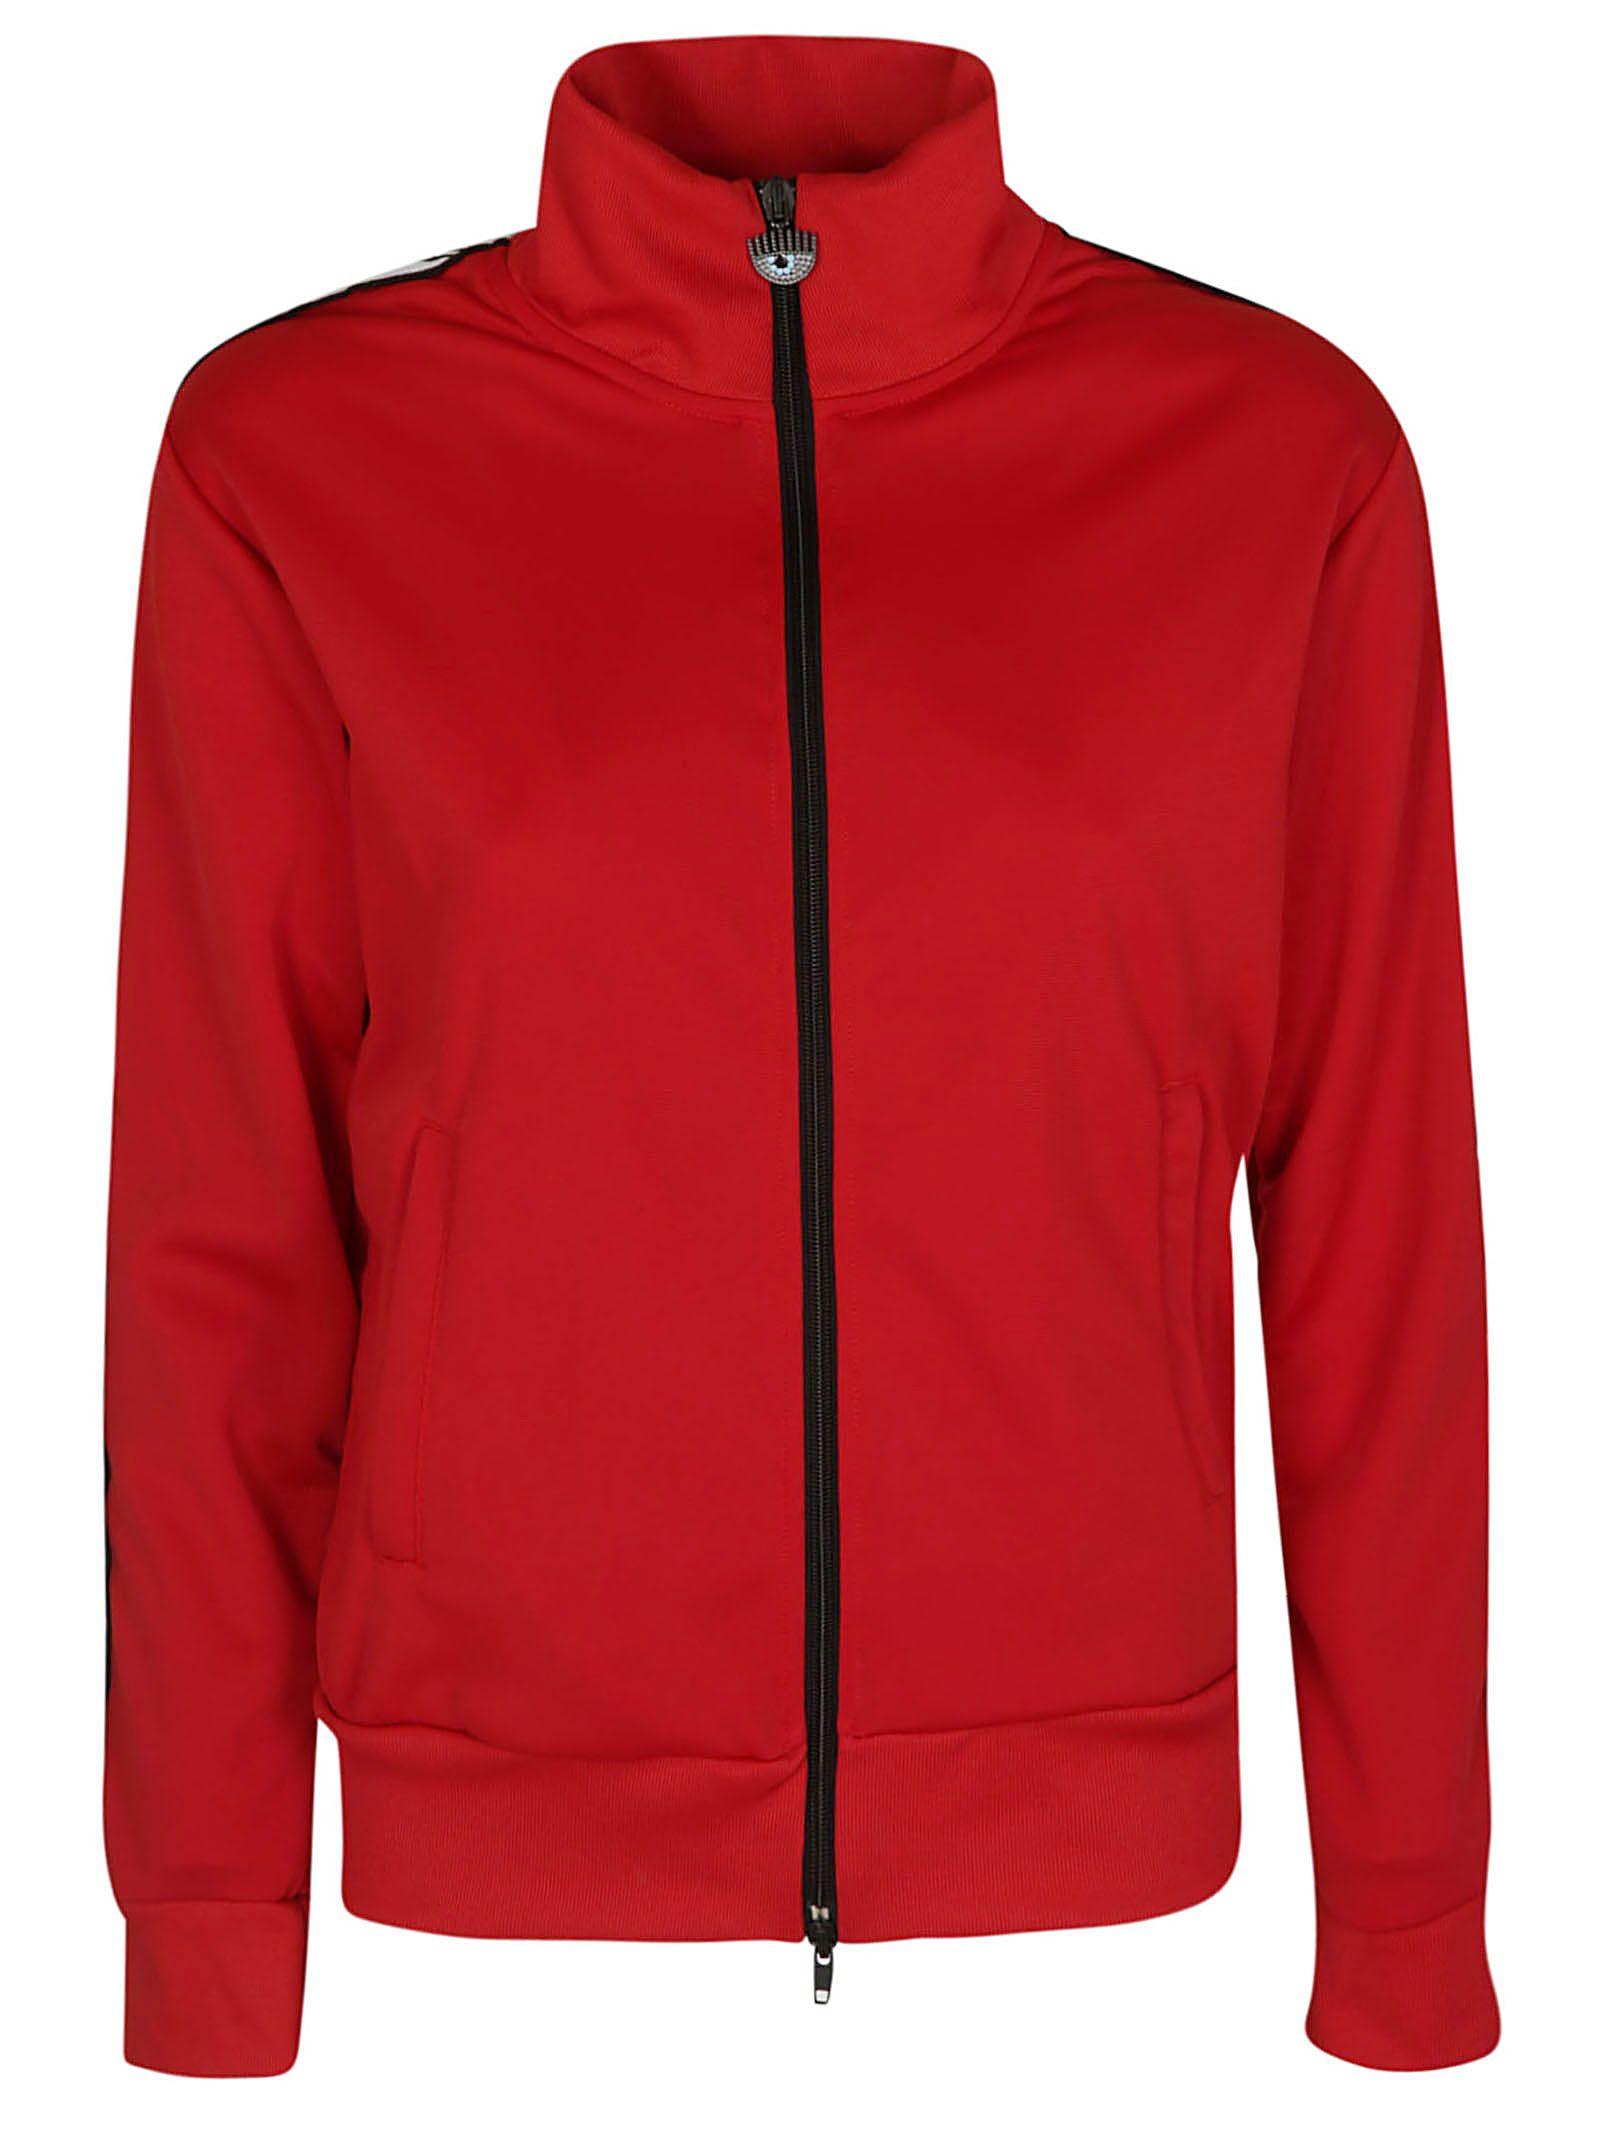 Chiara Ferragni Zipped Up Jacket